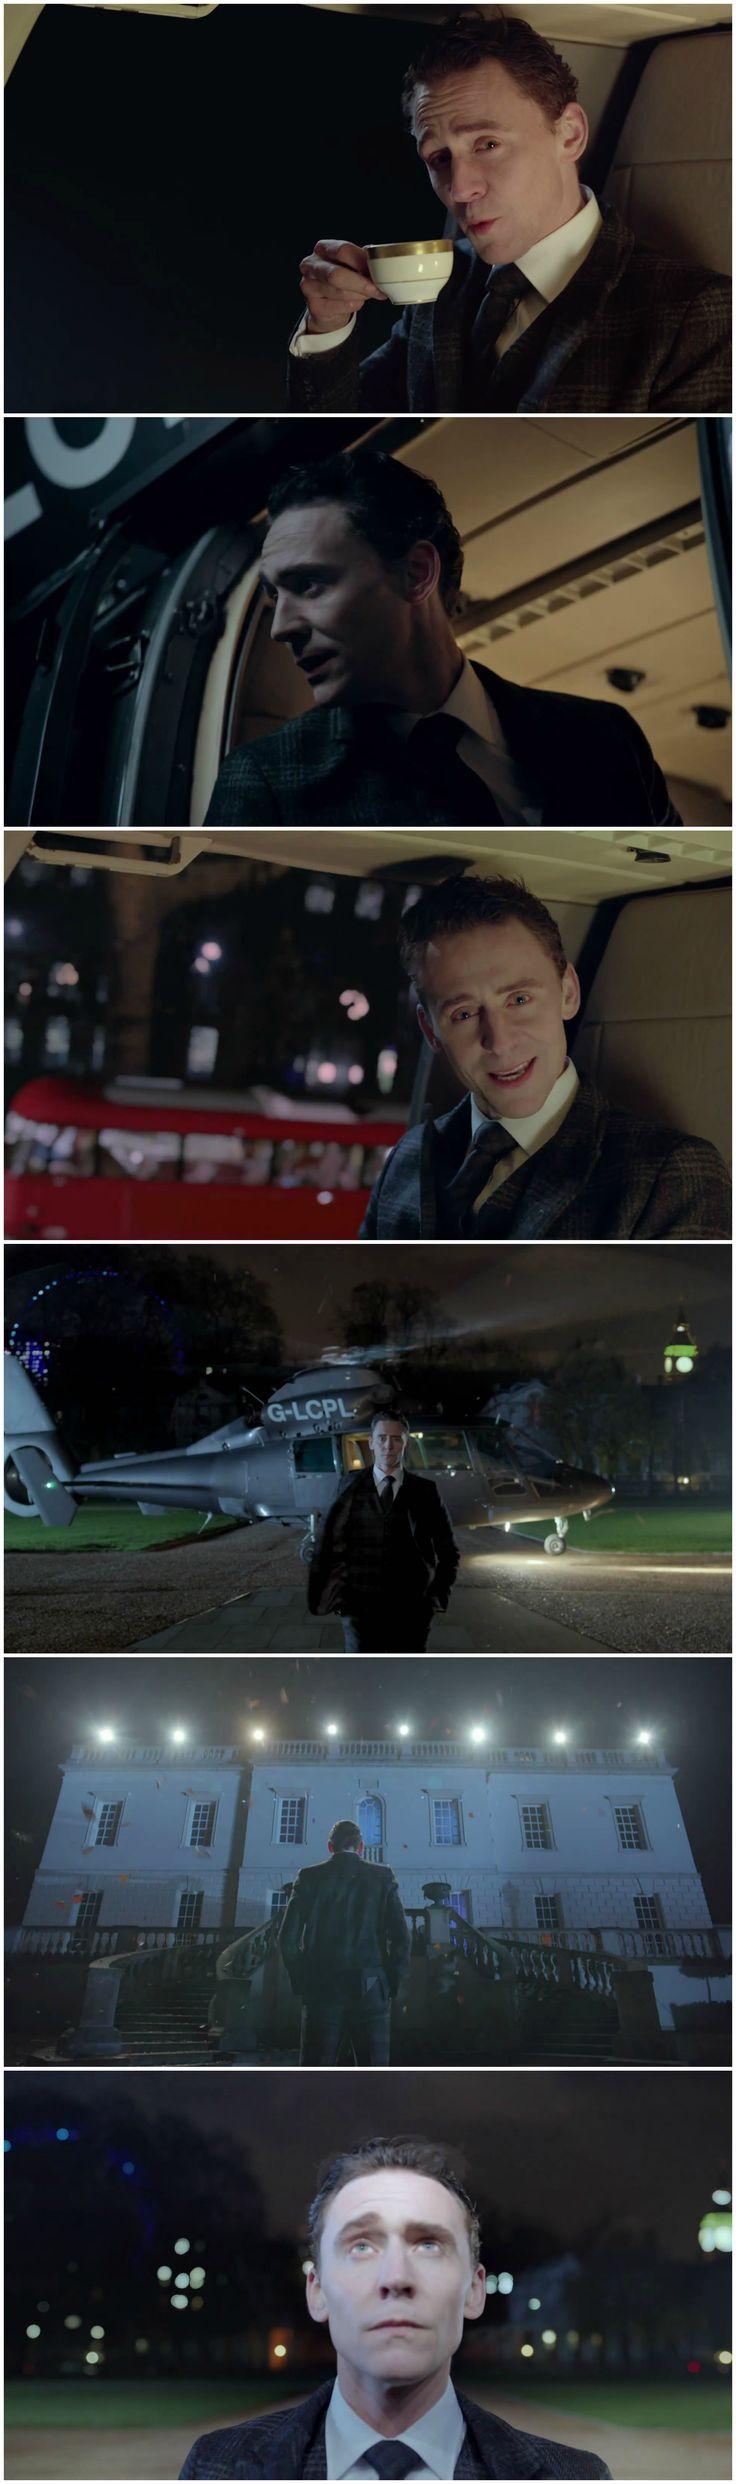 Jaguar 2014 Big Game Commercial | British Villains 'Rendezvous' | Jaguar USA (by Jaguar USA )<<<By far my favorite football game commercial...